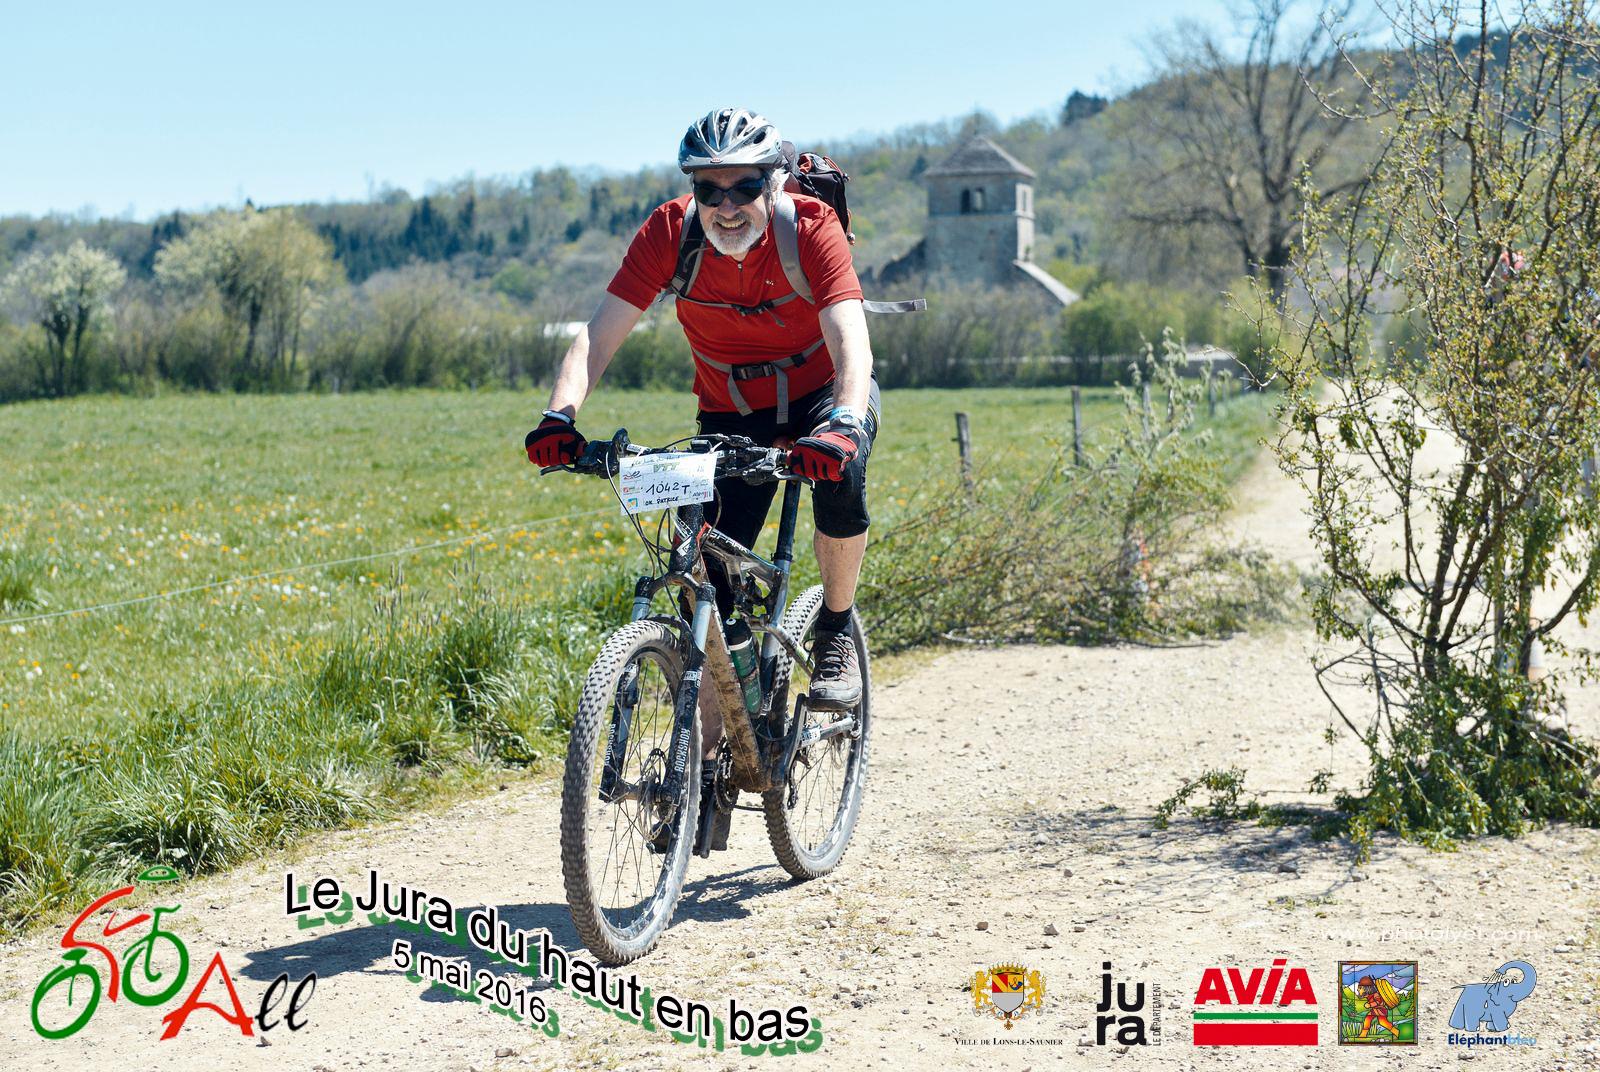 JHB 2016 - Didier 50km